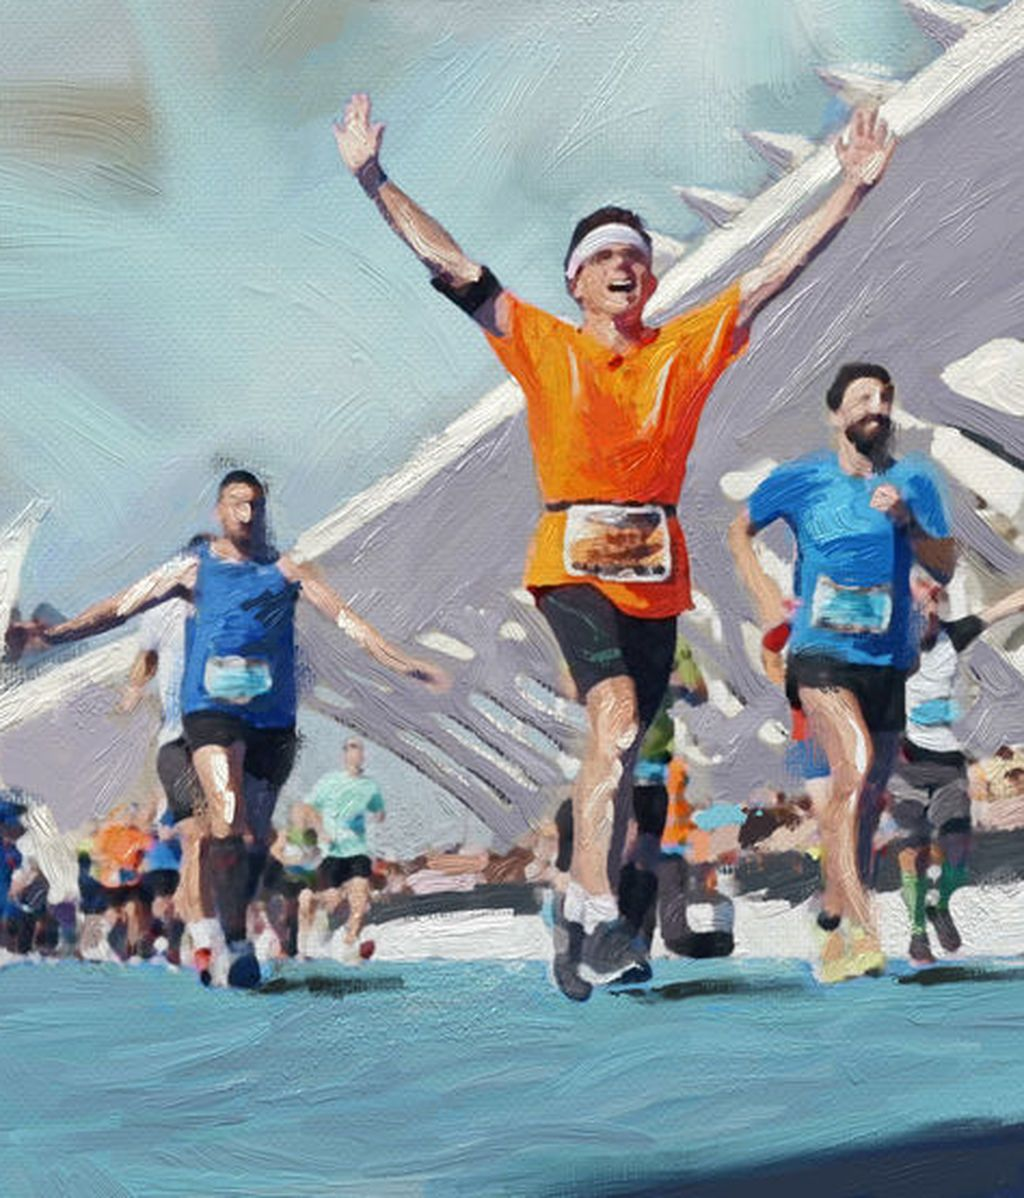 Sorolla da vida al Maratón Valencia en su 38ª edición